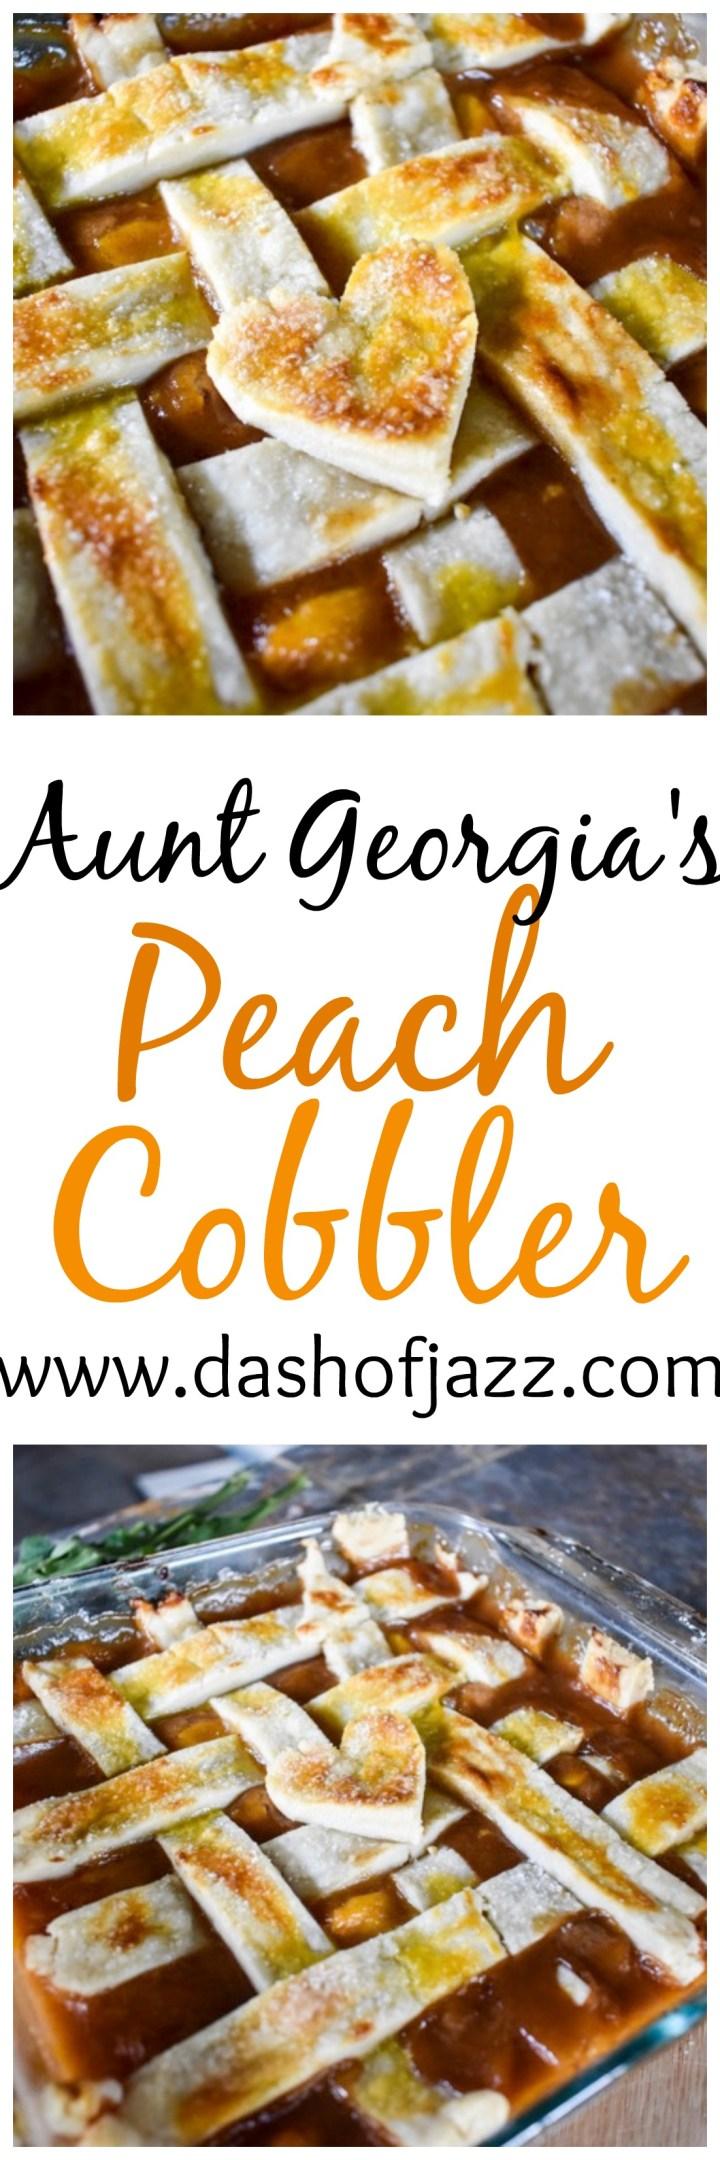 Aunt Georgia\'s Peach Cobbler + Black History Month Virtual Potluck